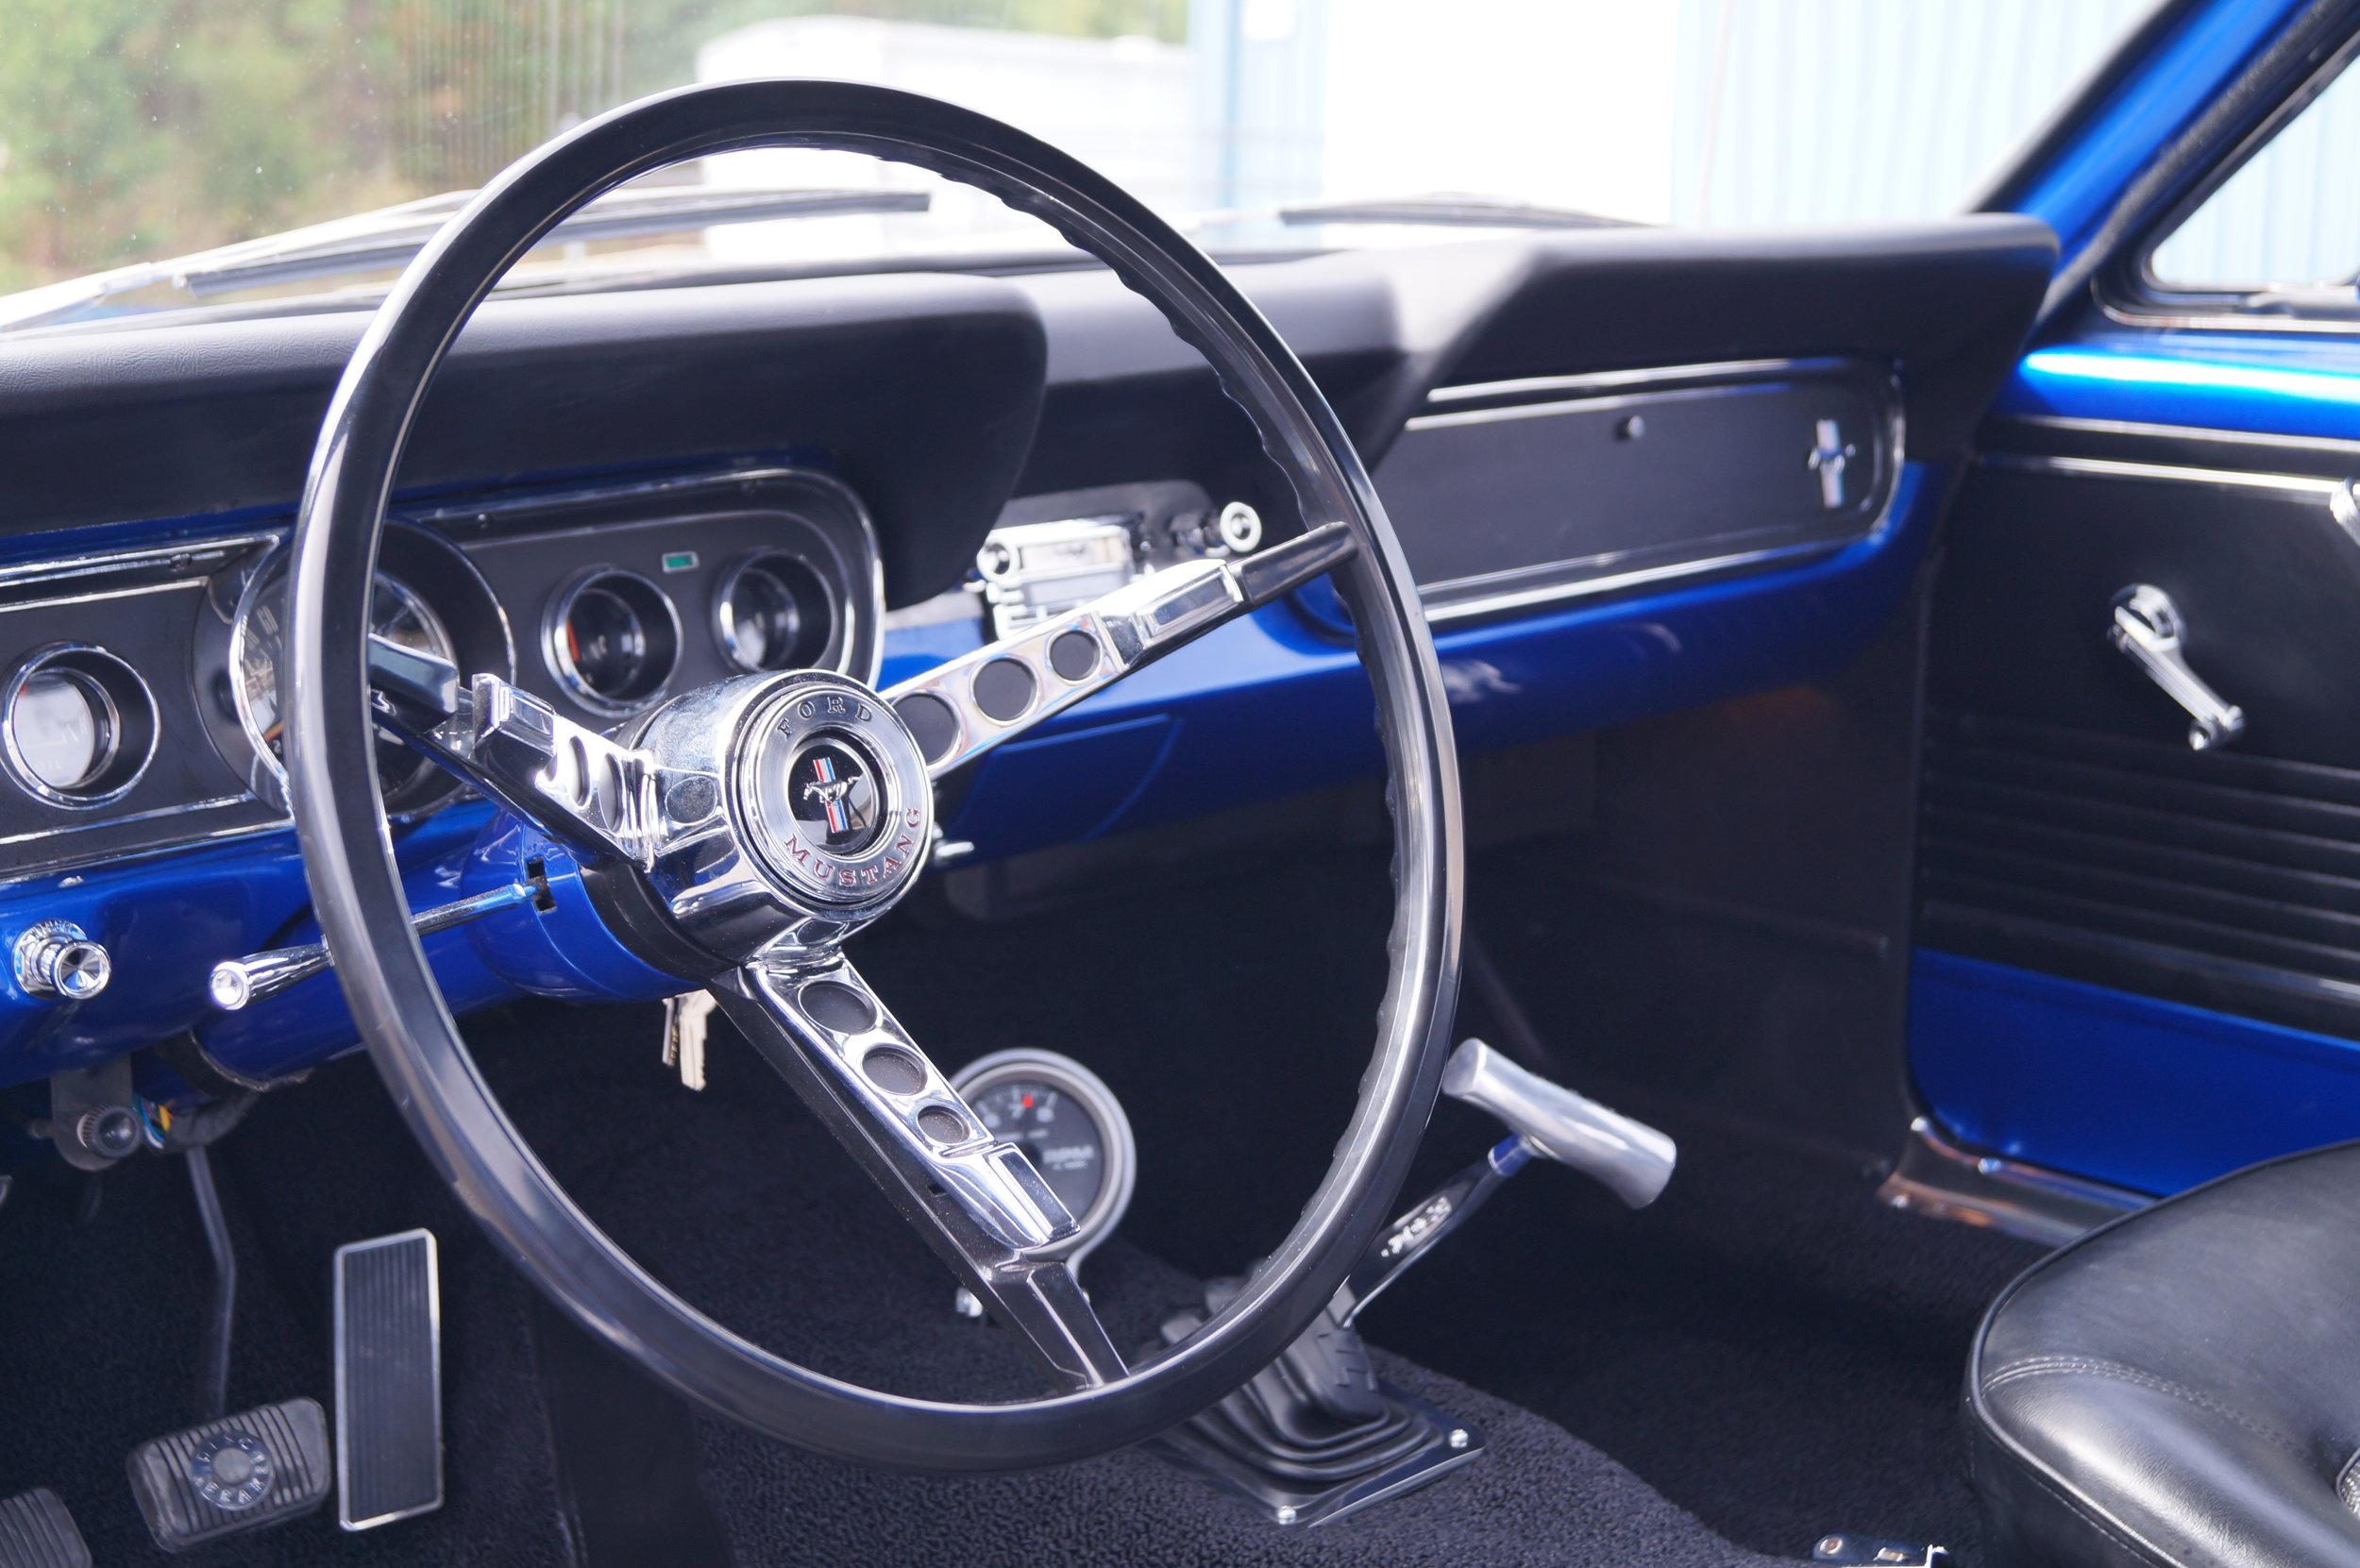 1966 Mustang -- DC 060.jpg